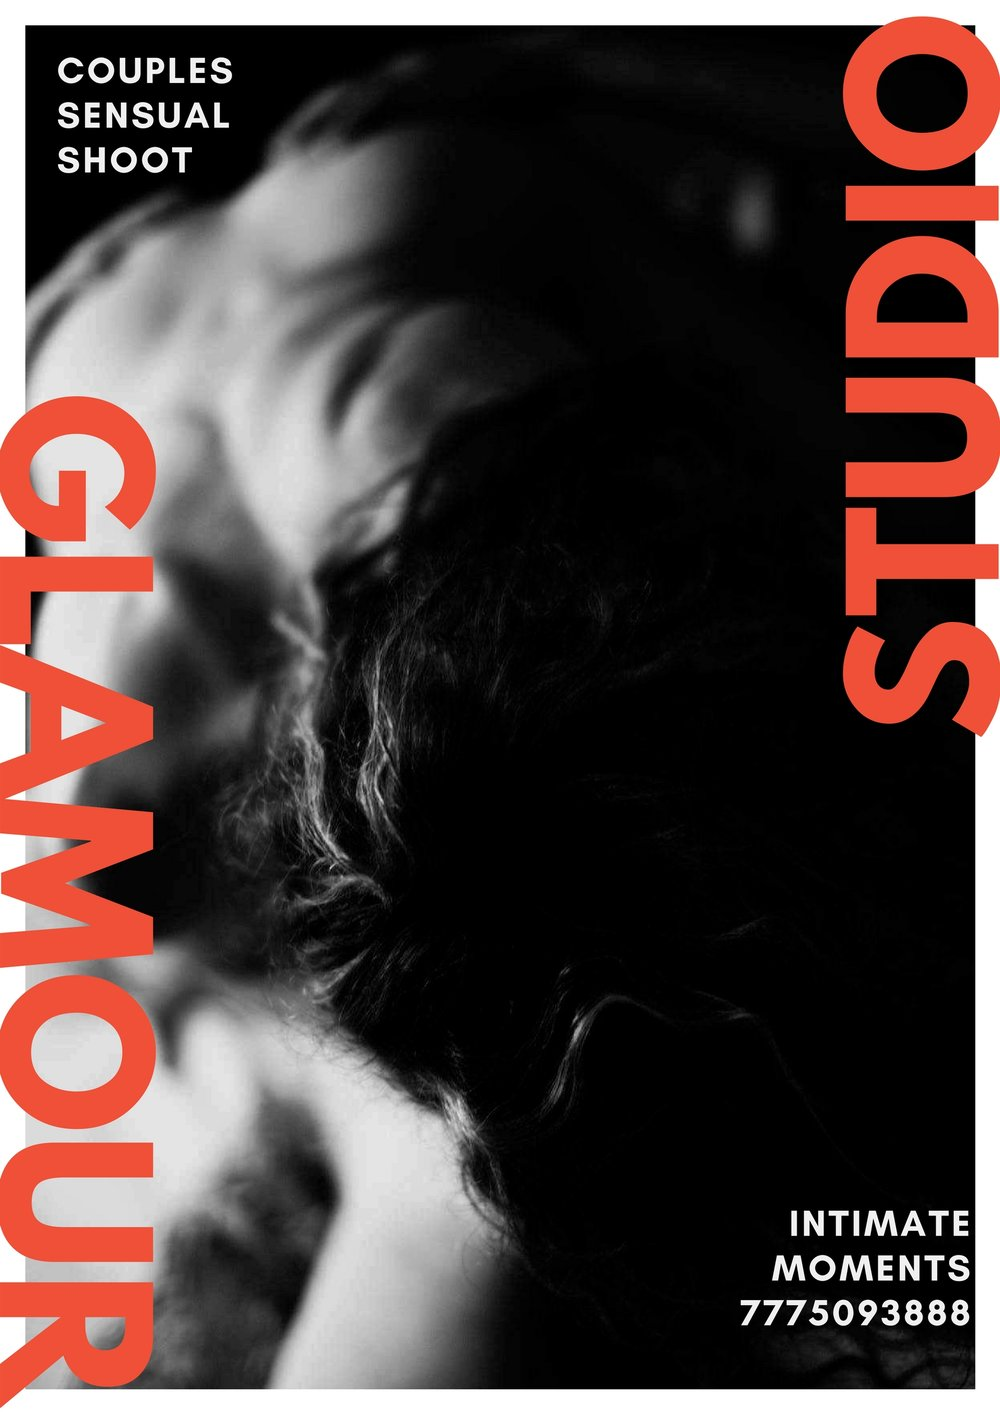 4juliawinterstudiolondon2018studioglamour couples boudoir photoshoot london.jpg